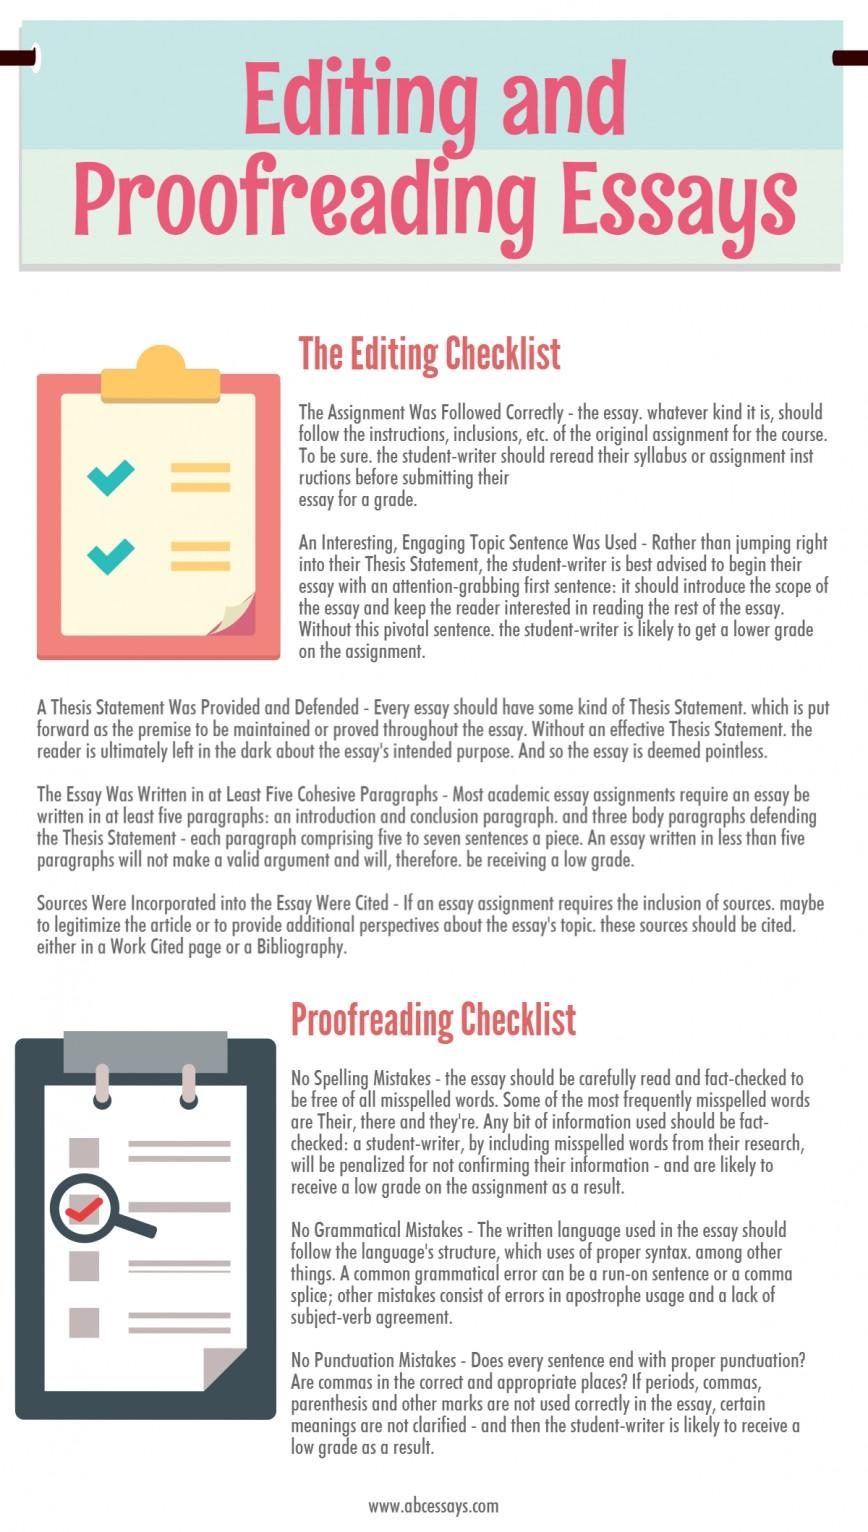 014 Editing Anding Essays Essay Example Unique Proofread Website University Uk